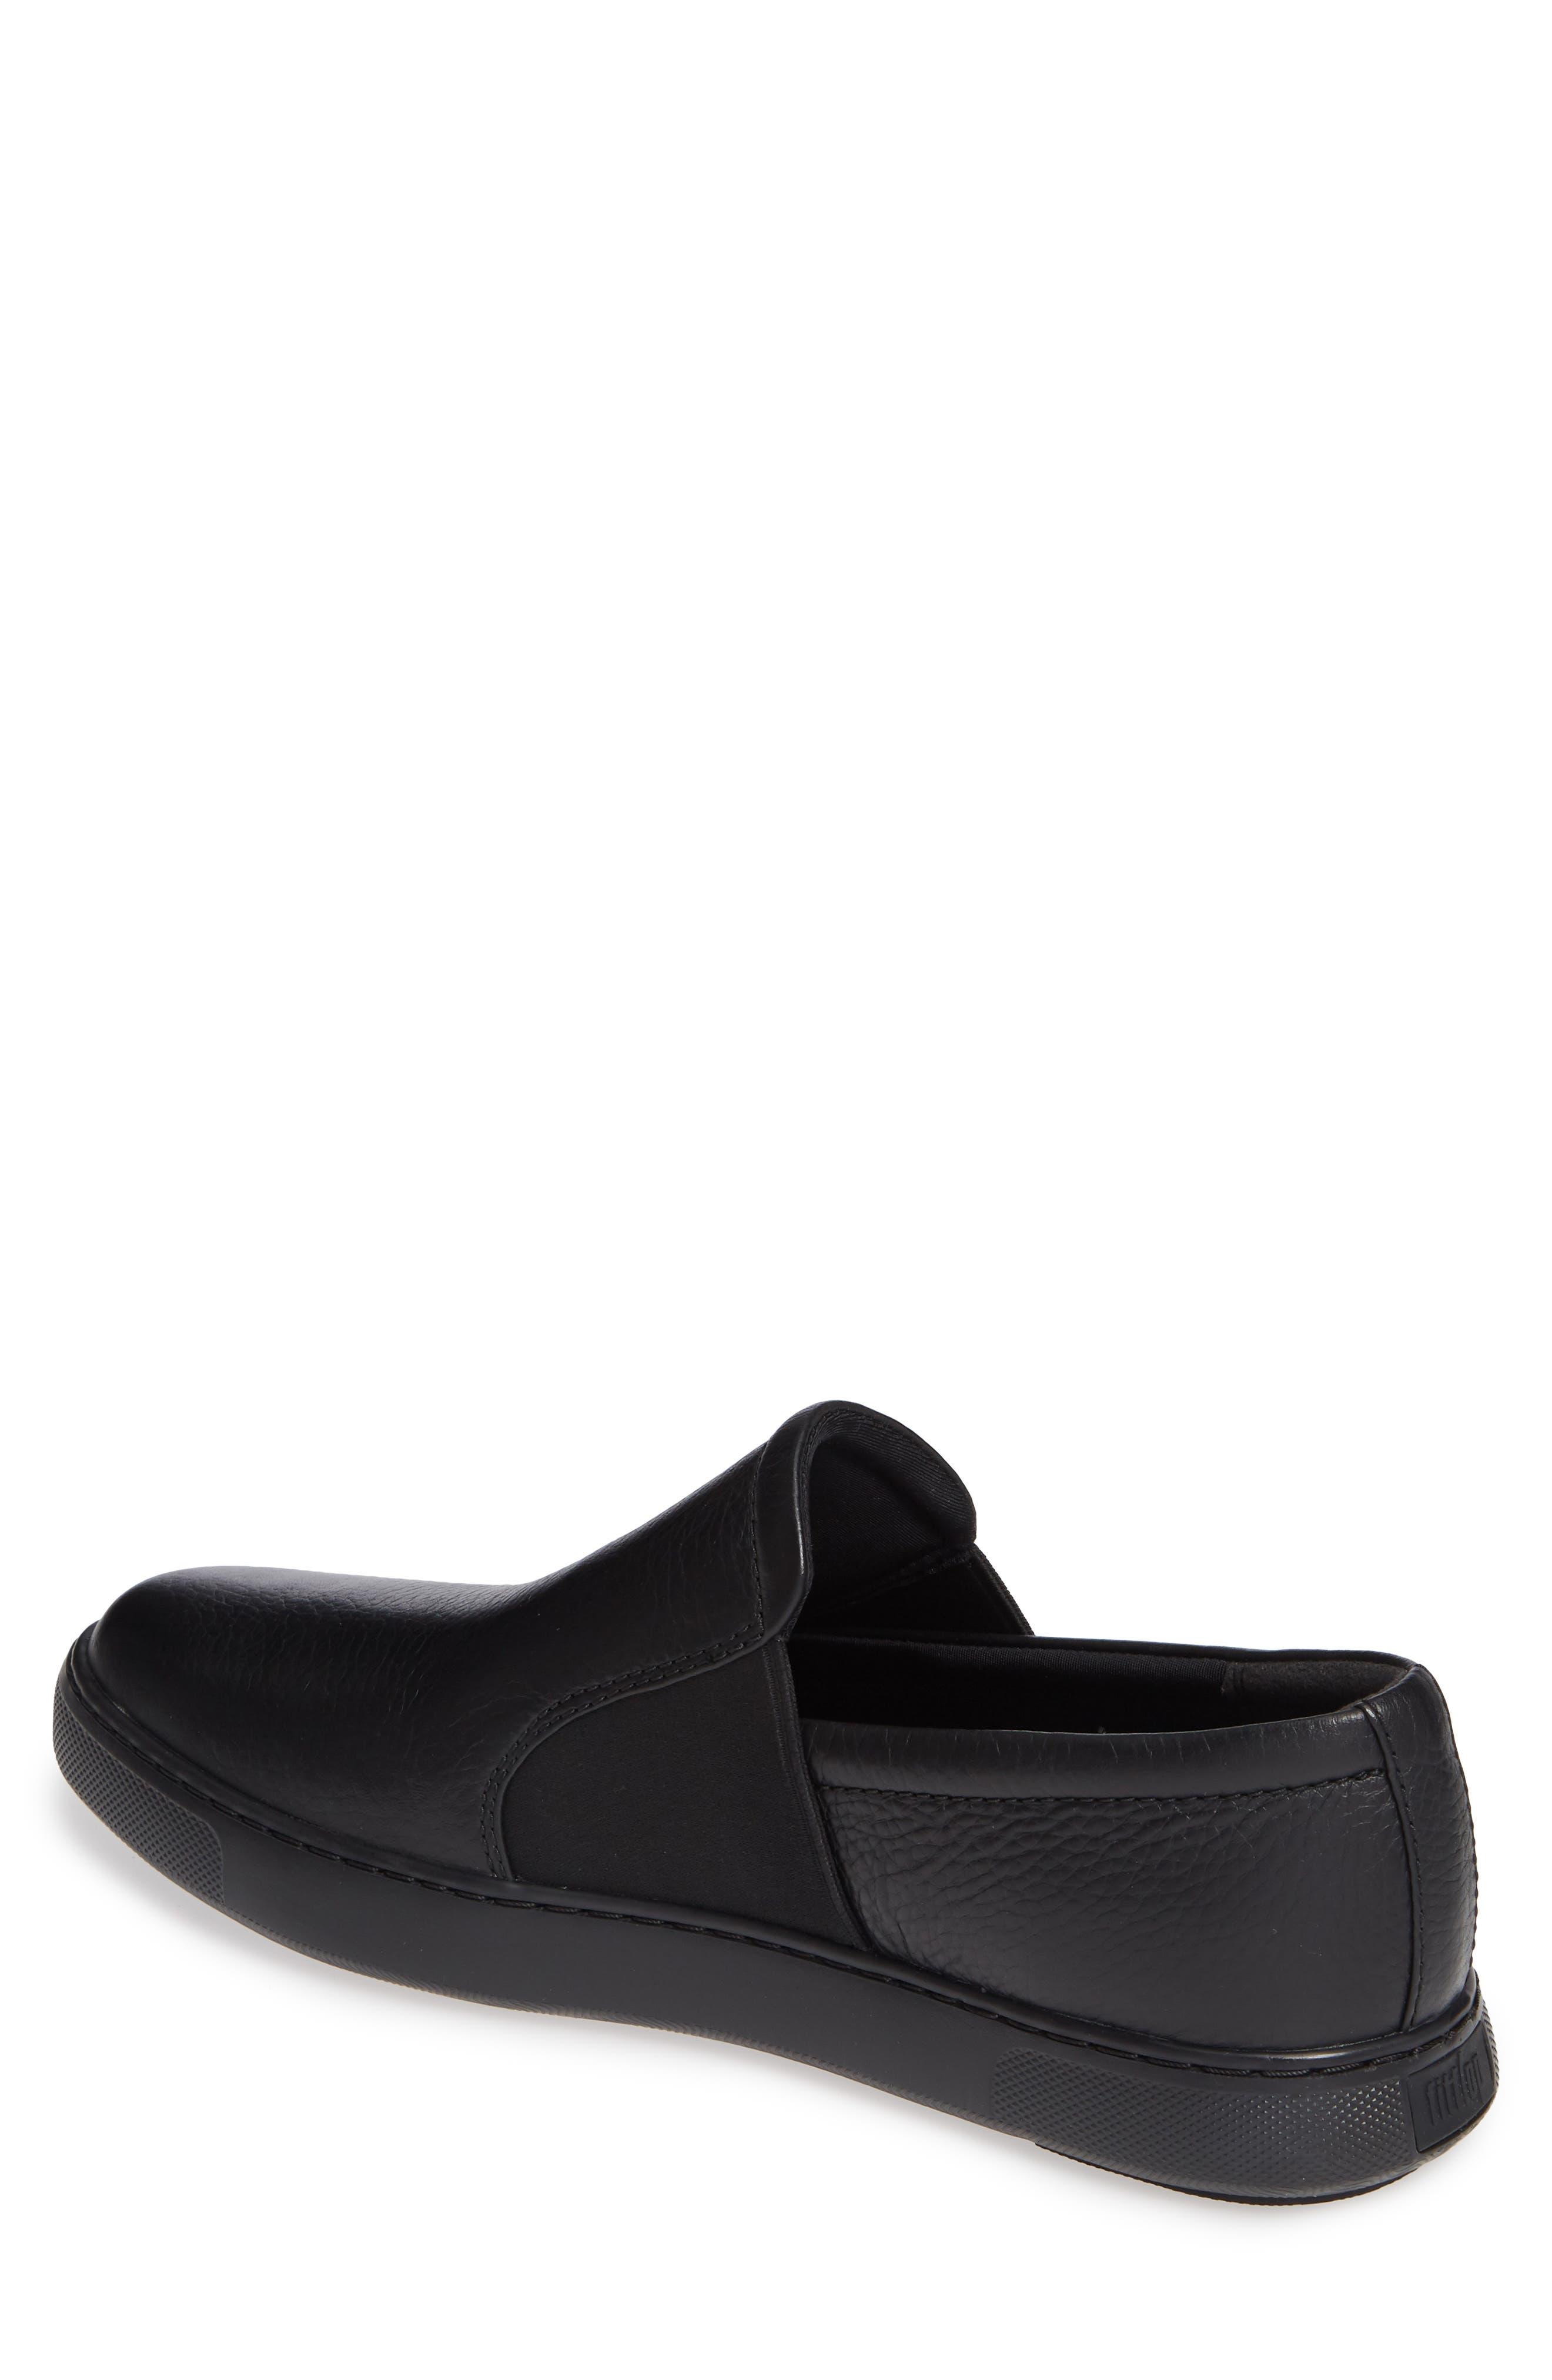 FITFLOP,                             Collins Slip-On Sneaker,                             Alternate thumbnail 2, color,                             BLACK